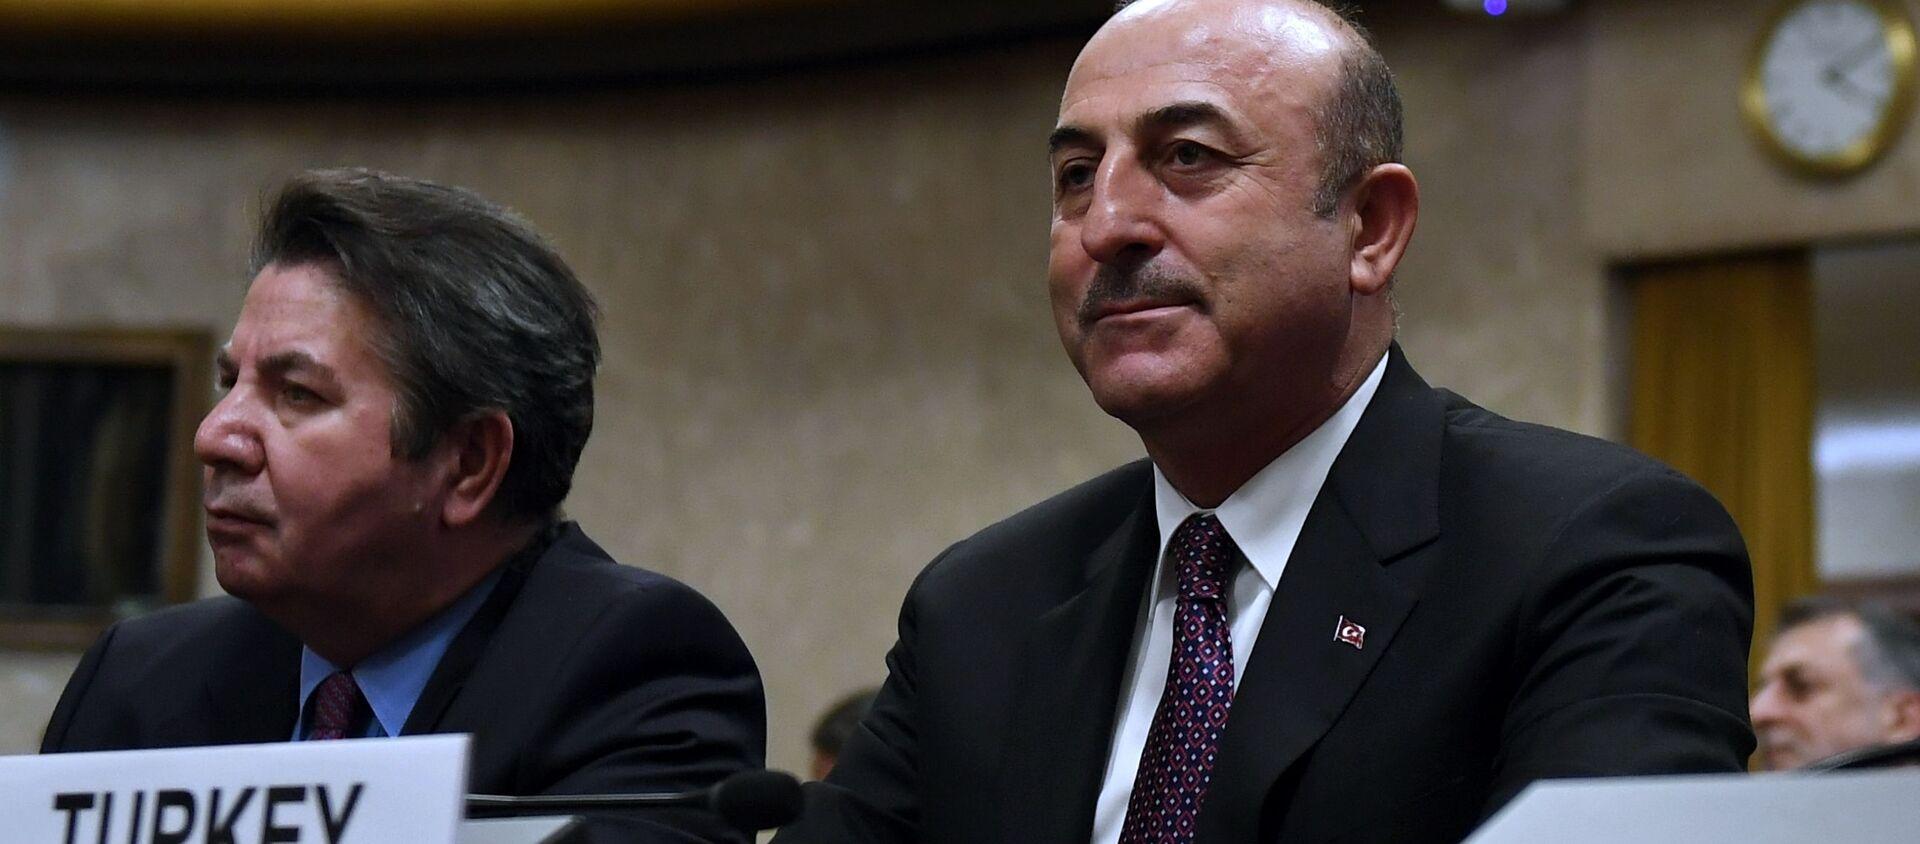 Министр иностранных дел Турции Мевлют Чавушоглу  - Sputnik Արմենիա, 1920, 22.08.2021